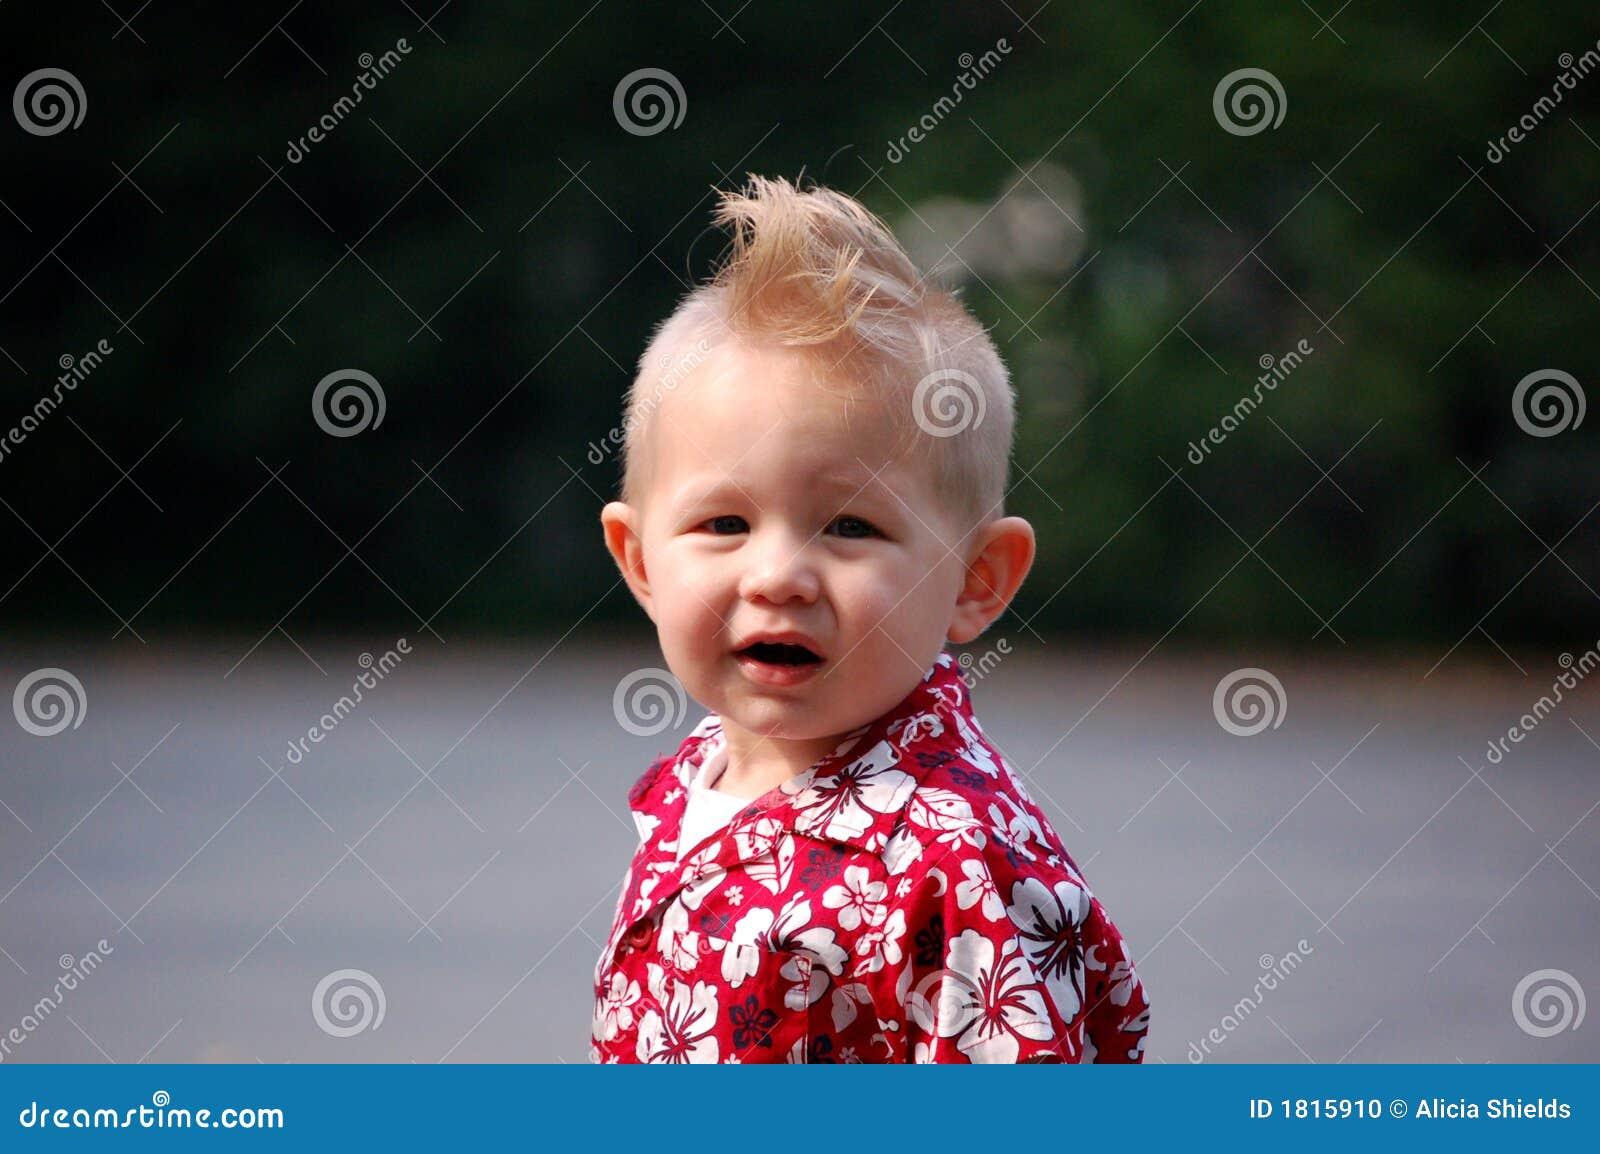 Mohawk Boy Stock Photo Image Of Smile Mohawk Kids Haircut 1815910